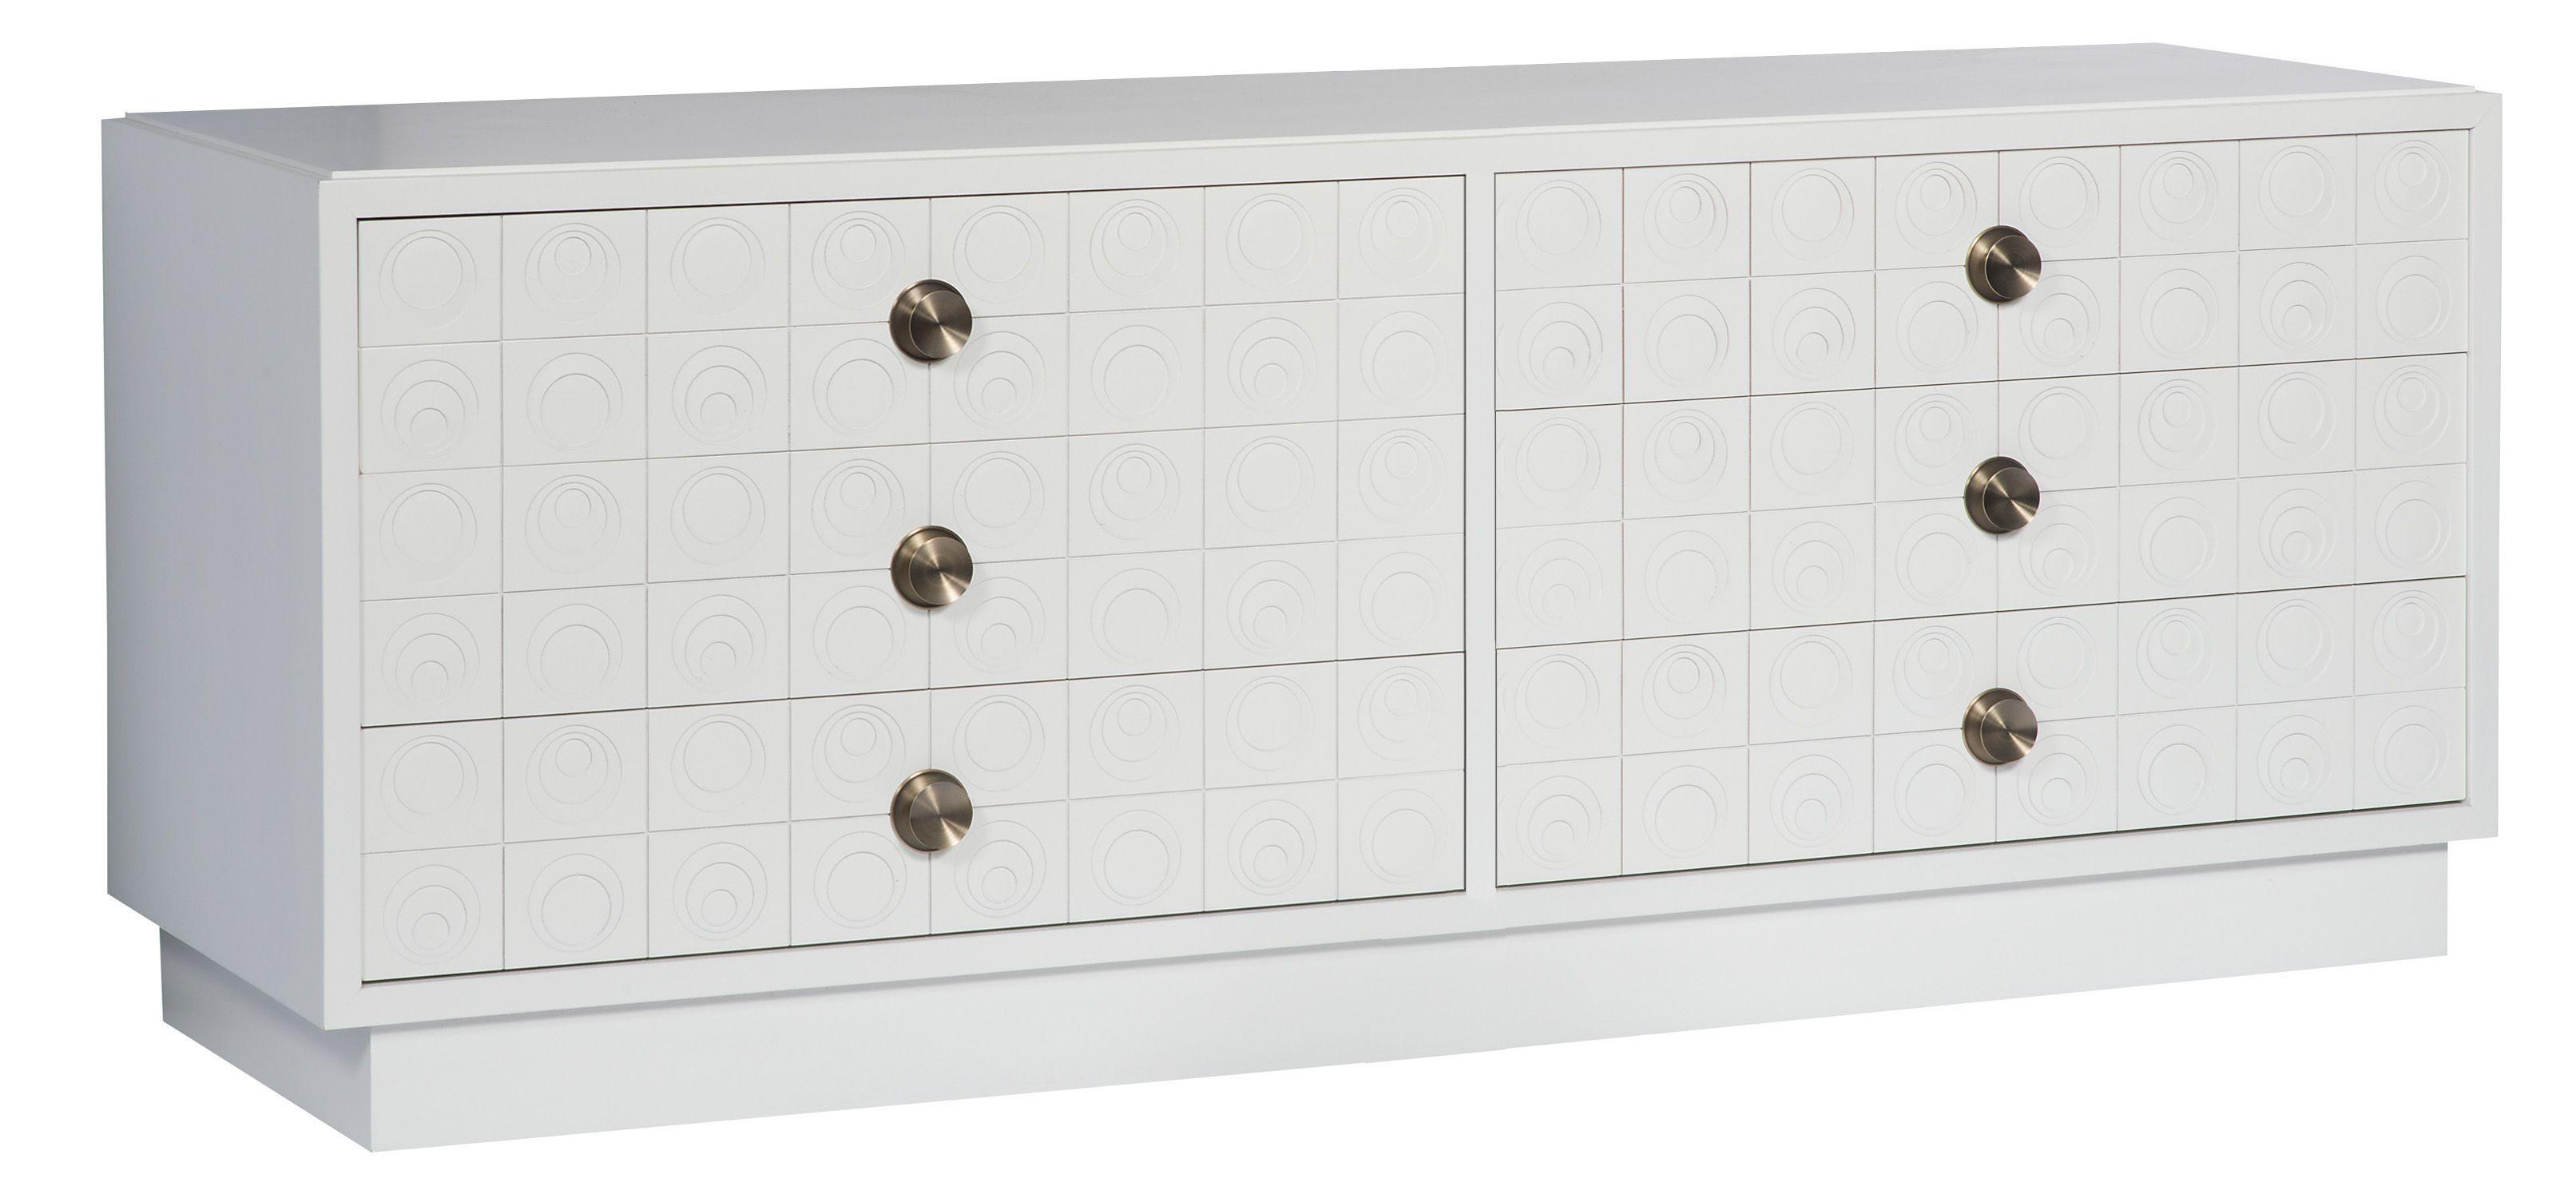 Mcguire Dresser Cc02d Vanguard Furniture White Dresser Wide Dresser [ 1500 x 3225 Pixel ]